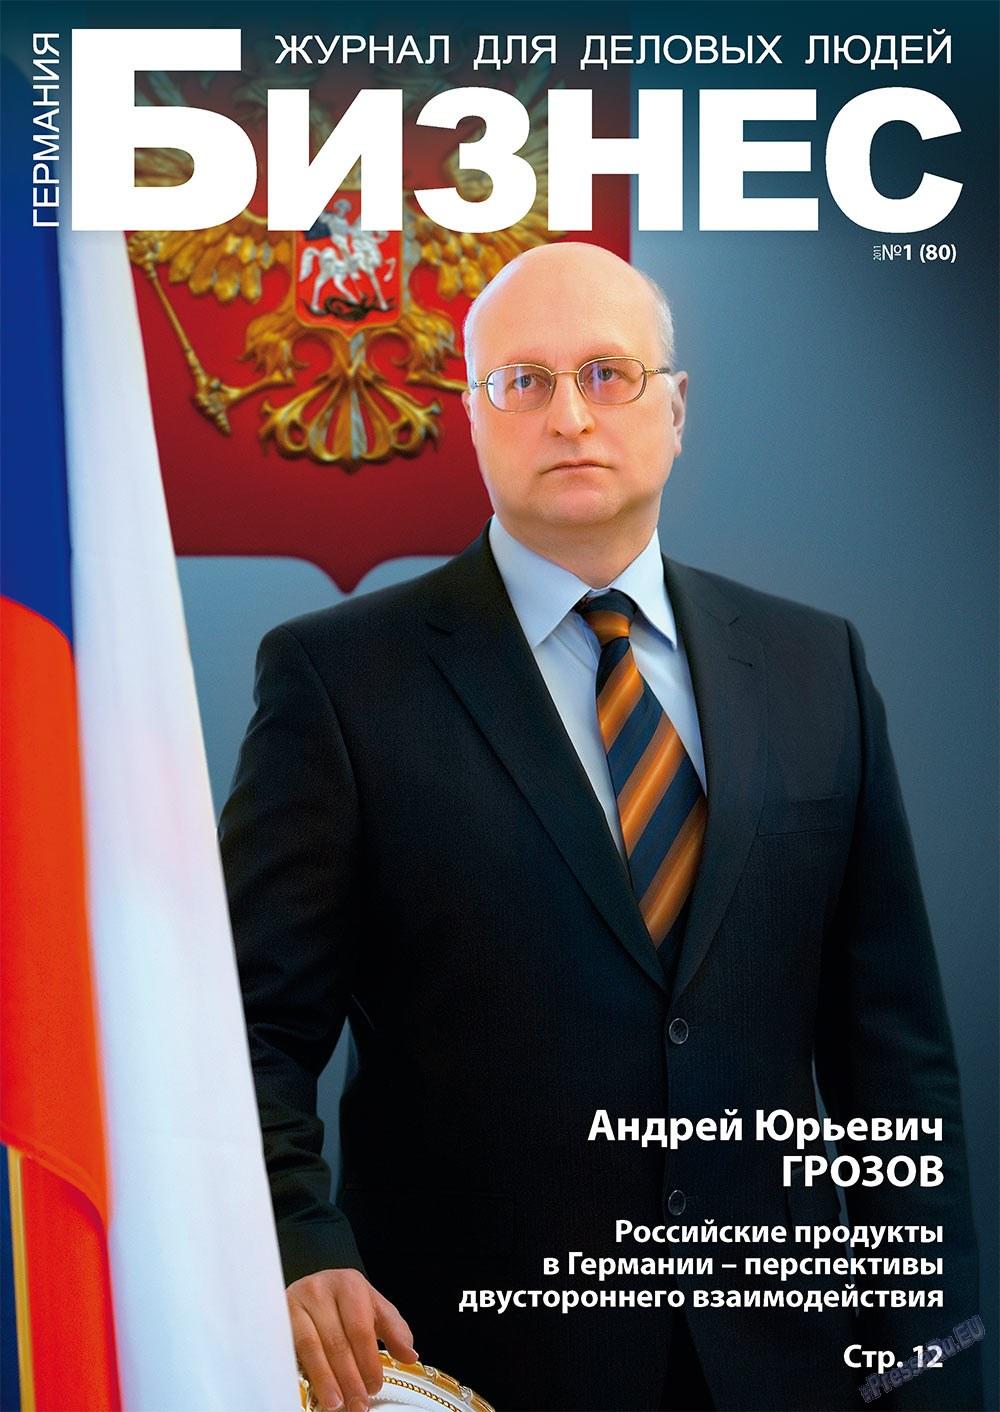 Бизнес (журнал). 2011 год, номер 1, стр. 1